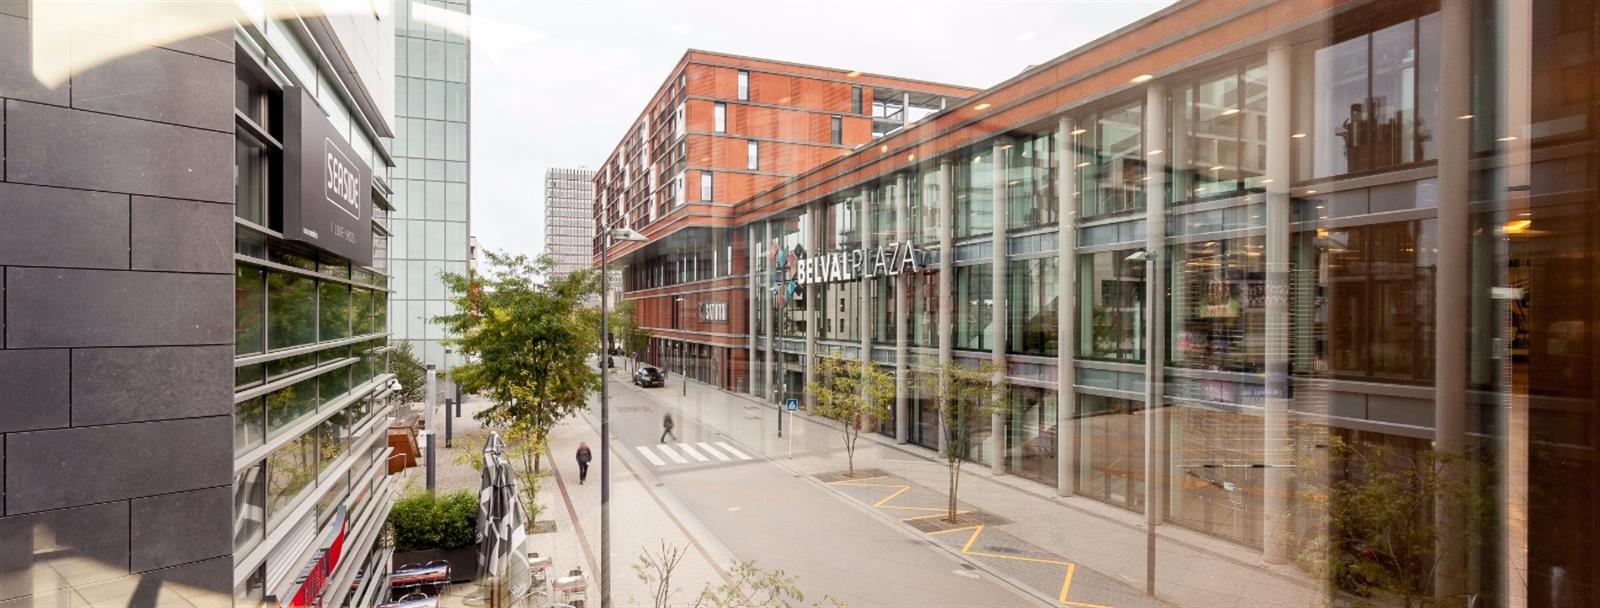 belval plaza shopping center centre commercial supermarch editus. Black Bedroom Furniture Sets. Home Design Ideas